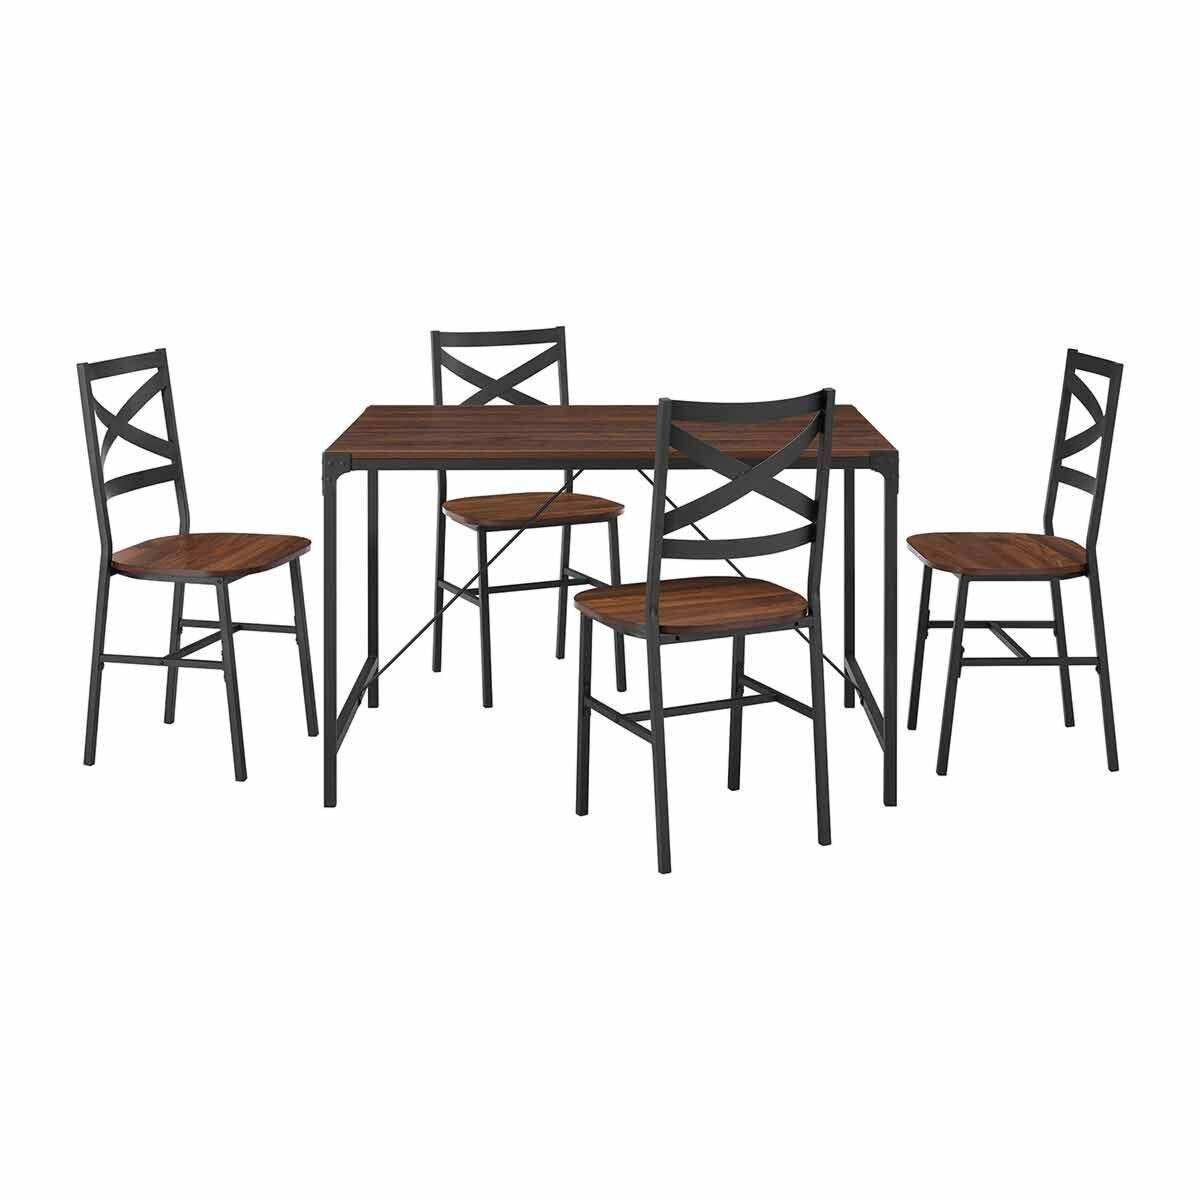 Logrono 5 Piece Angle Iron Dining Set